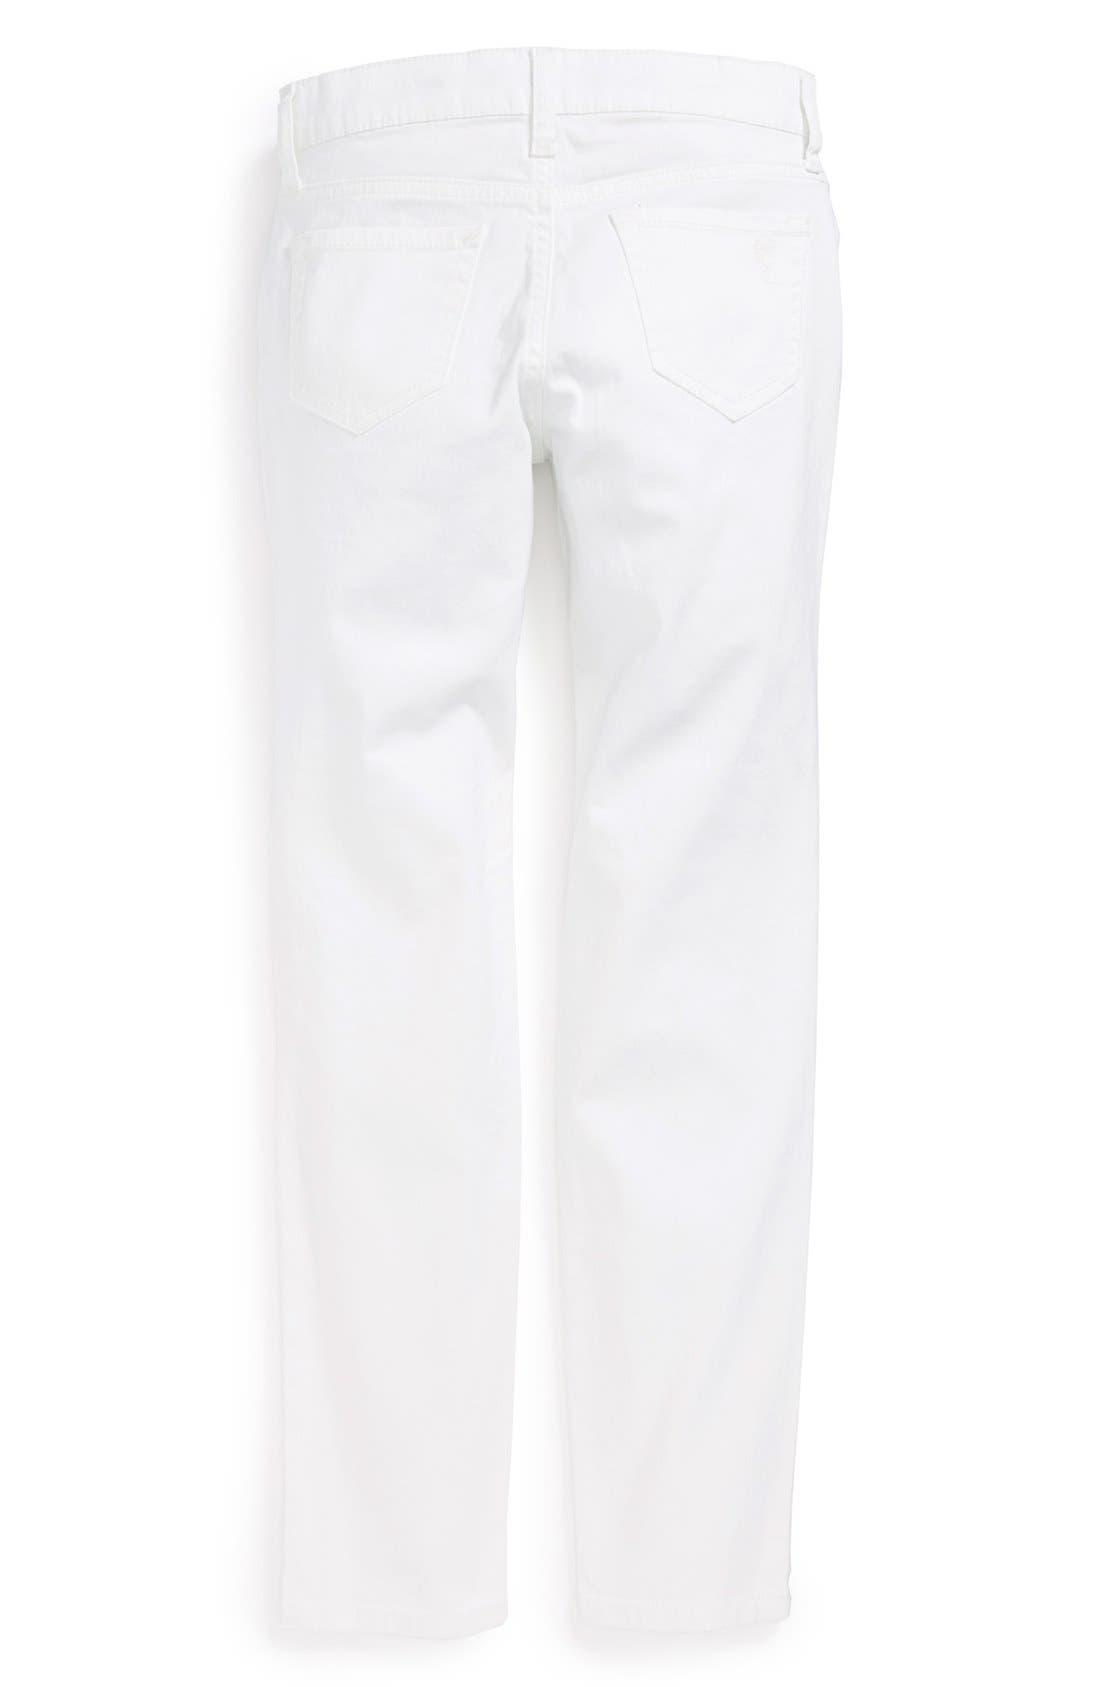 Main Image - Jessica Simpson 'Kiss Me' Skinny Jeans (Big Girls)